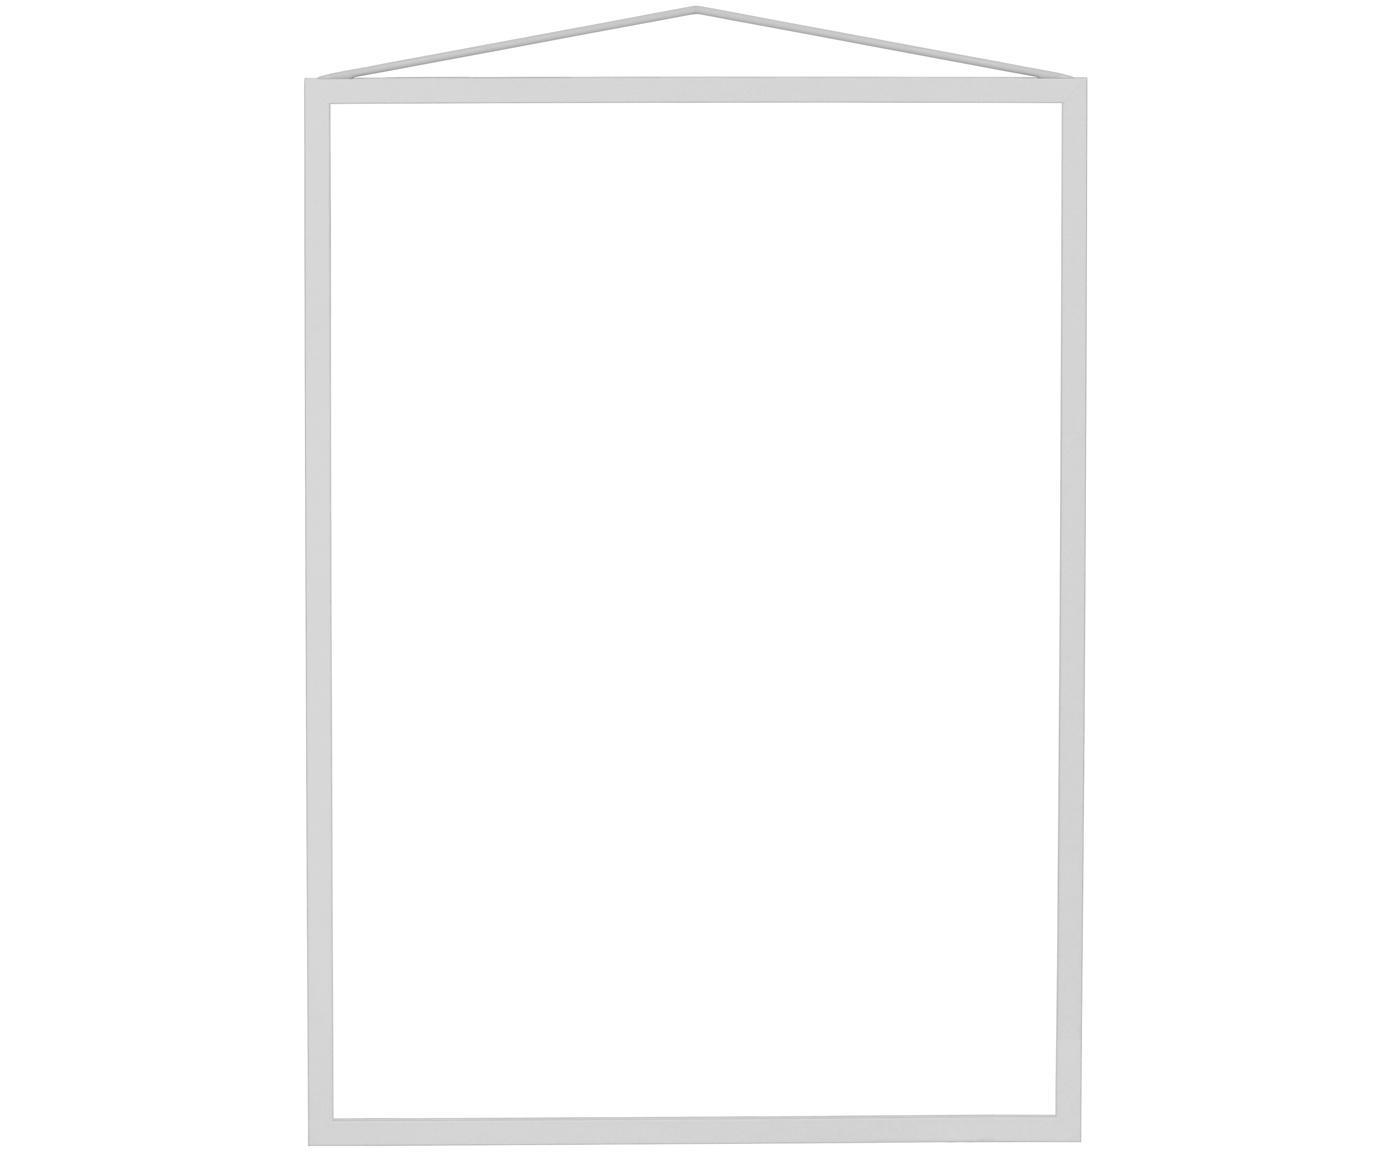 Cornice Colour Frame, Cornice: acciaio, verniciato a pol, Grigio, 30 x 42 cm